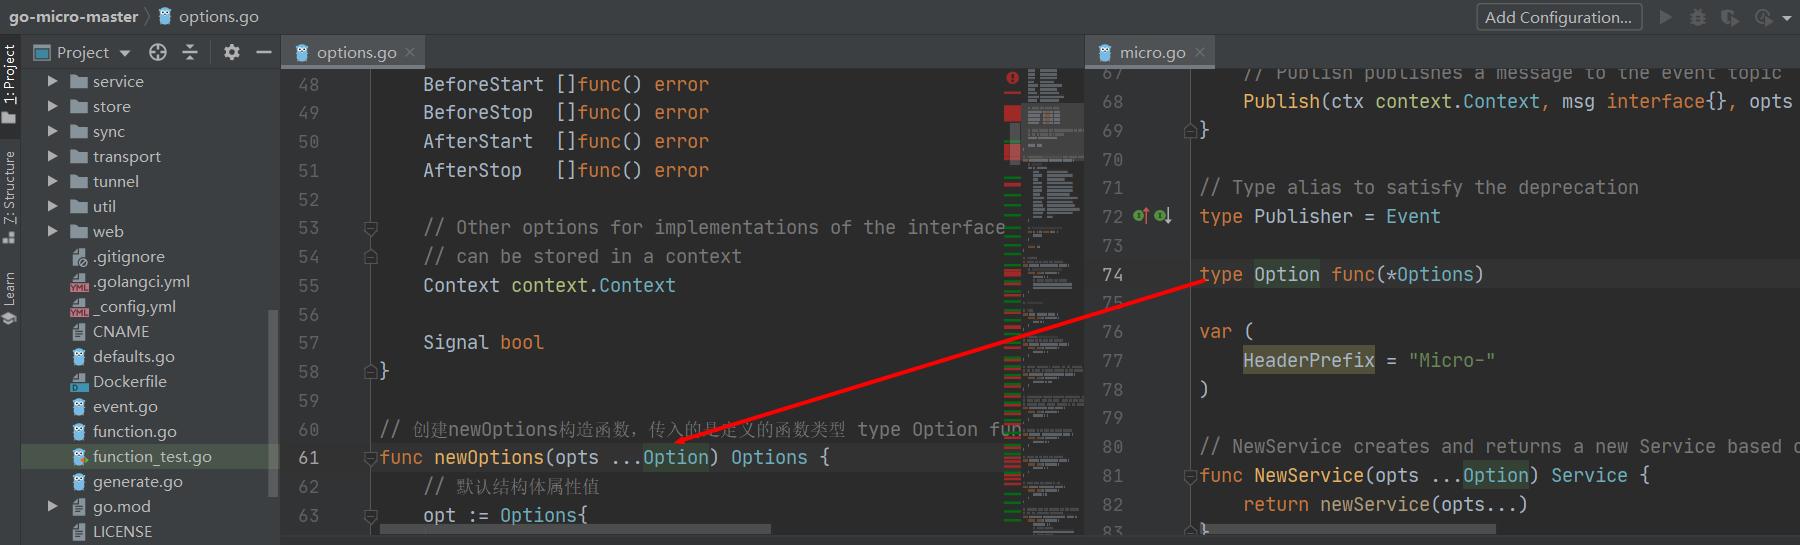 go-micro里面的options的函数式选择模式.png